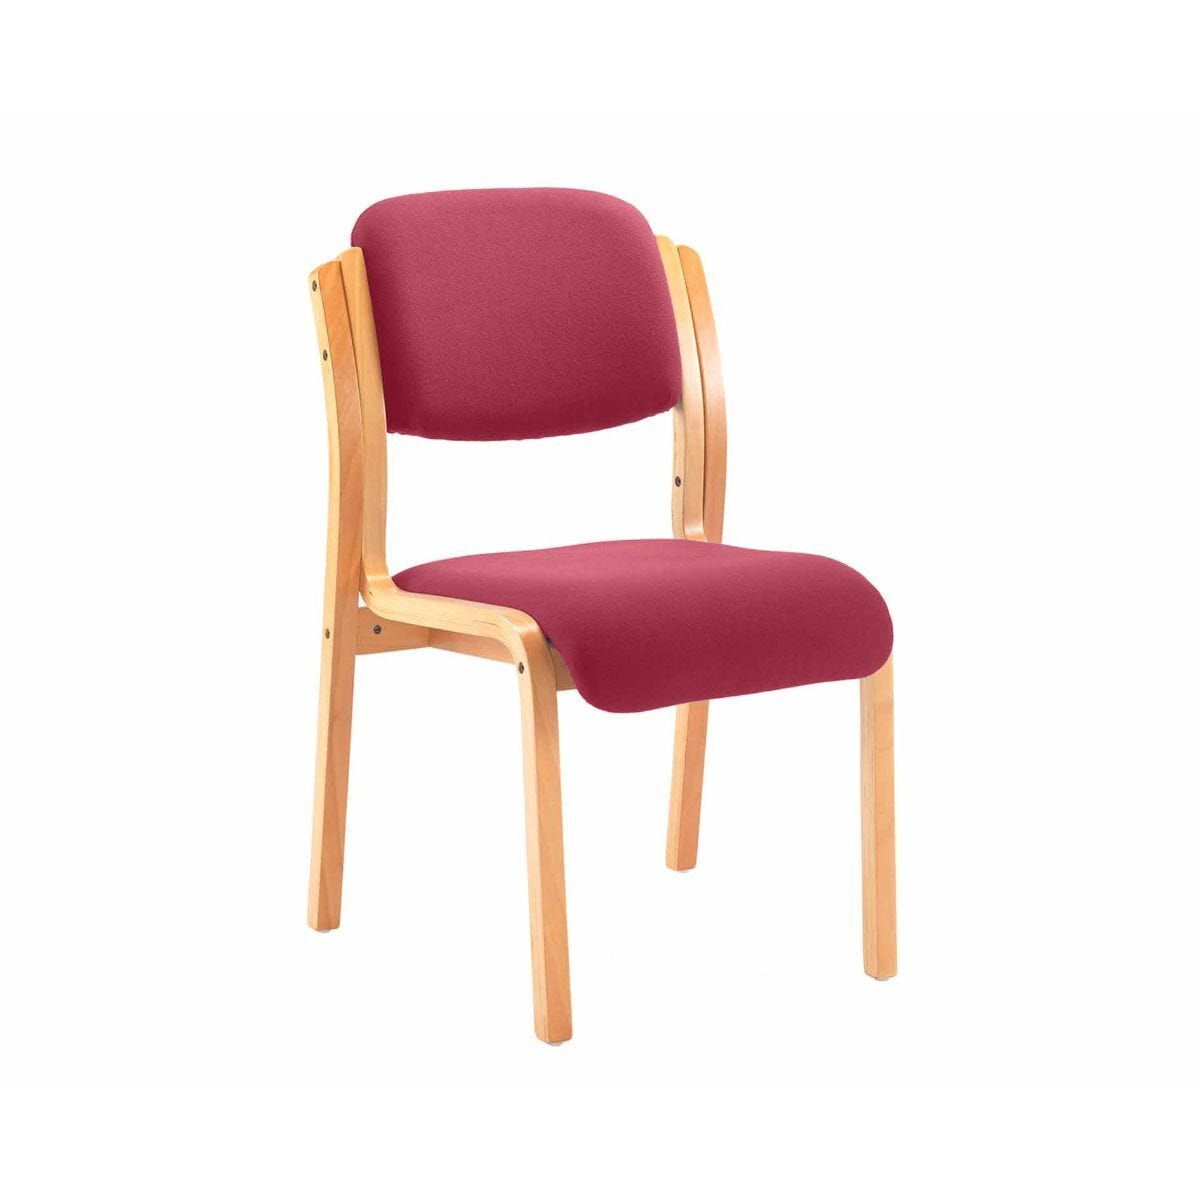 TC Office Renoir Wooden Frame Side Chair Claret